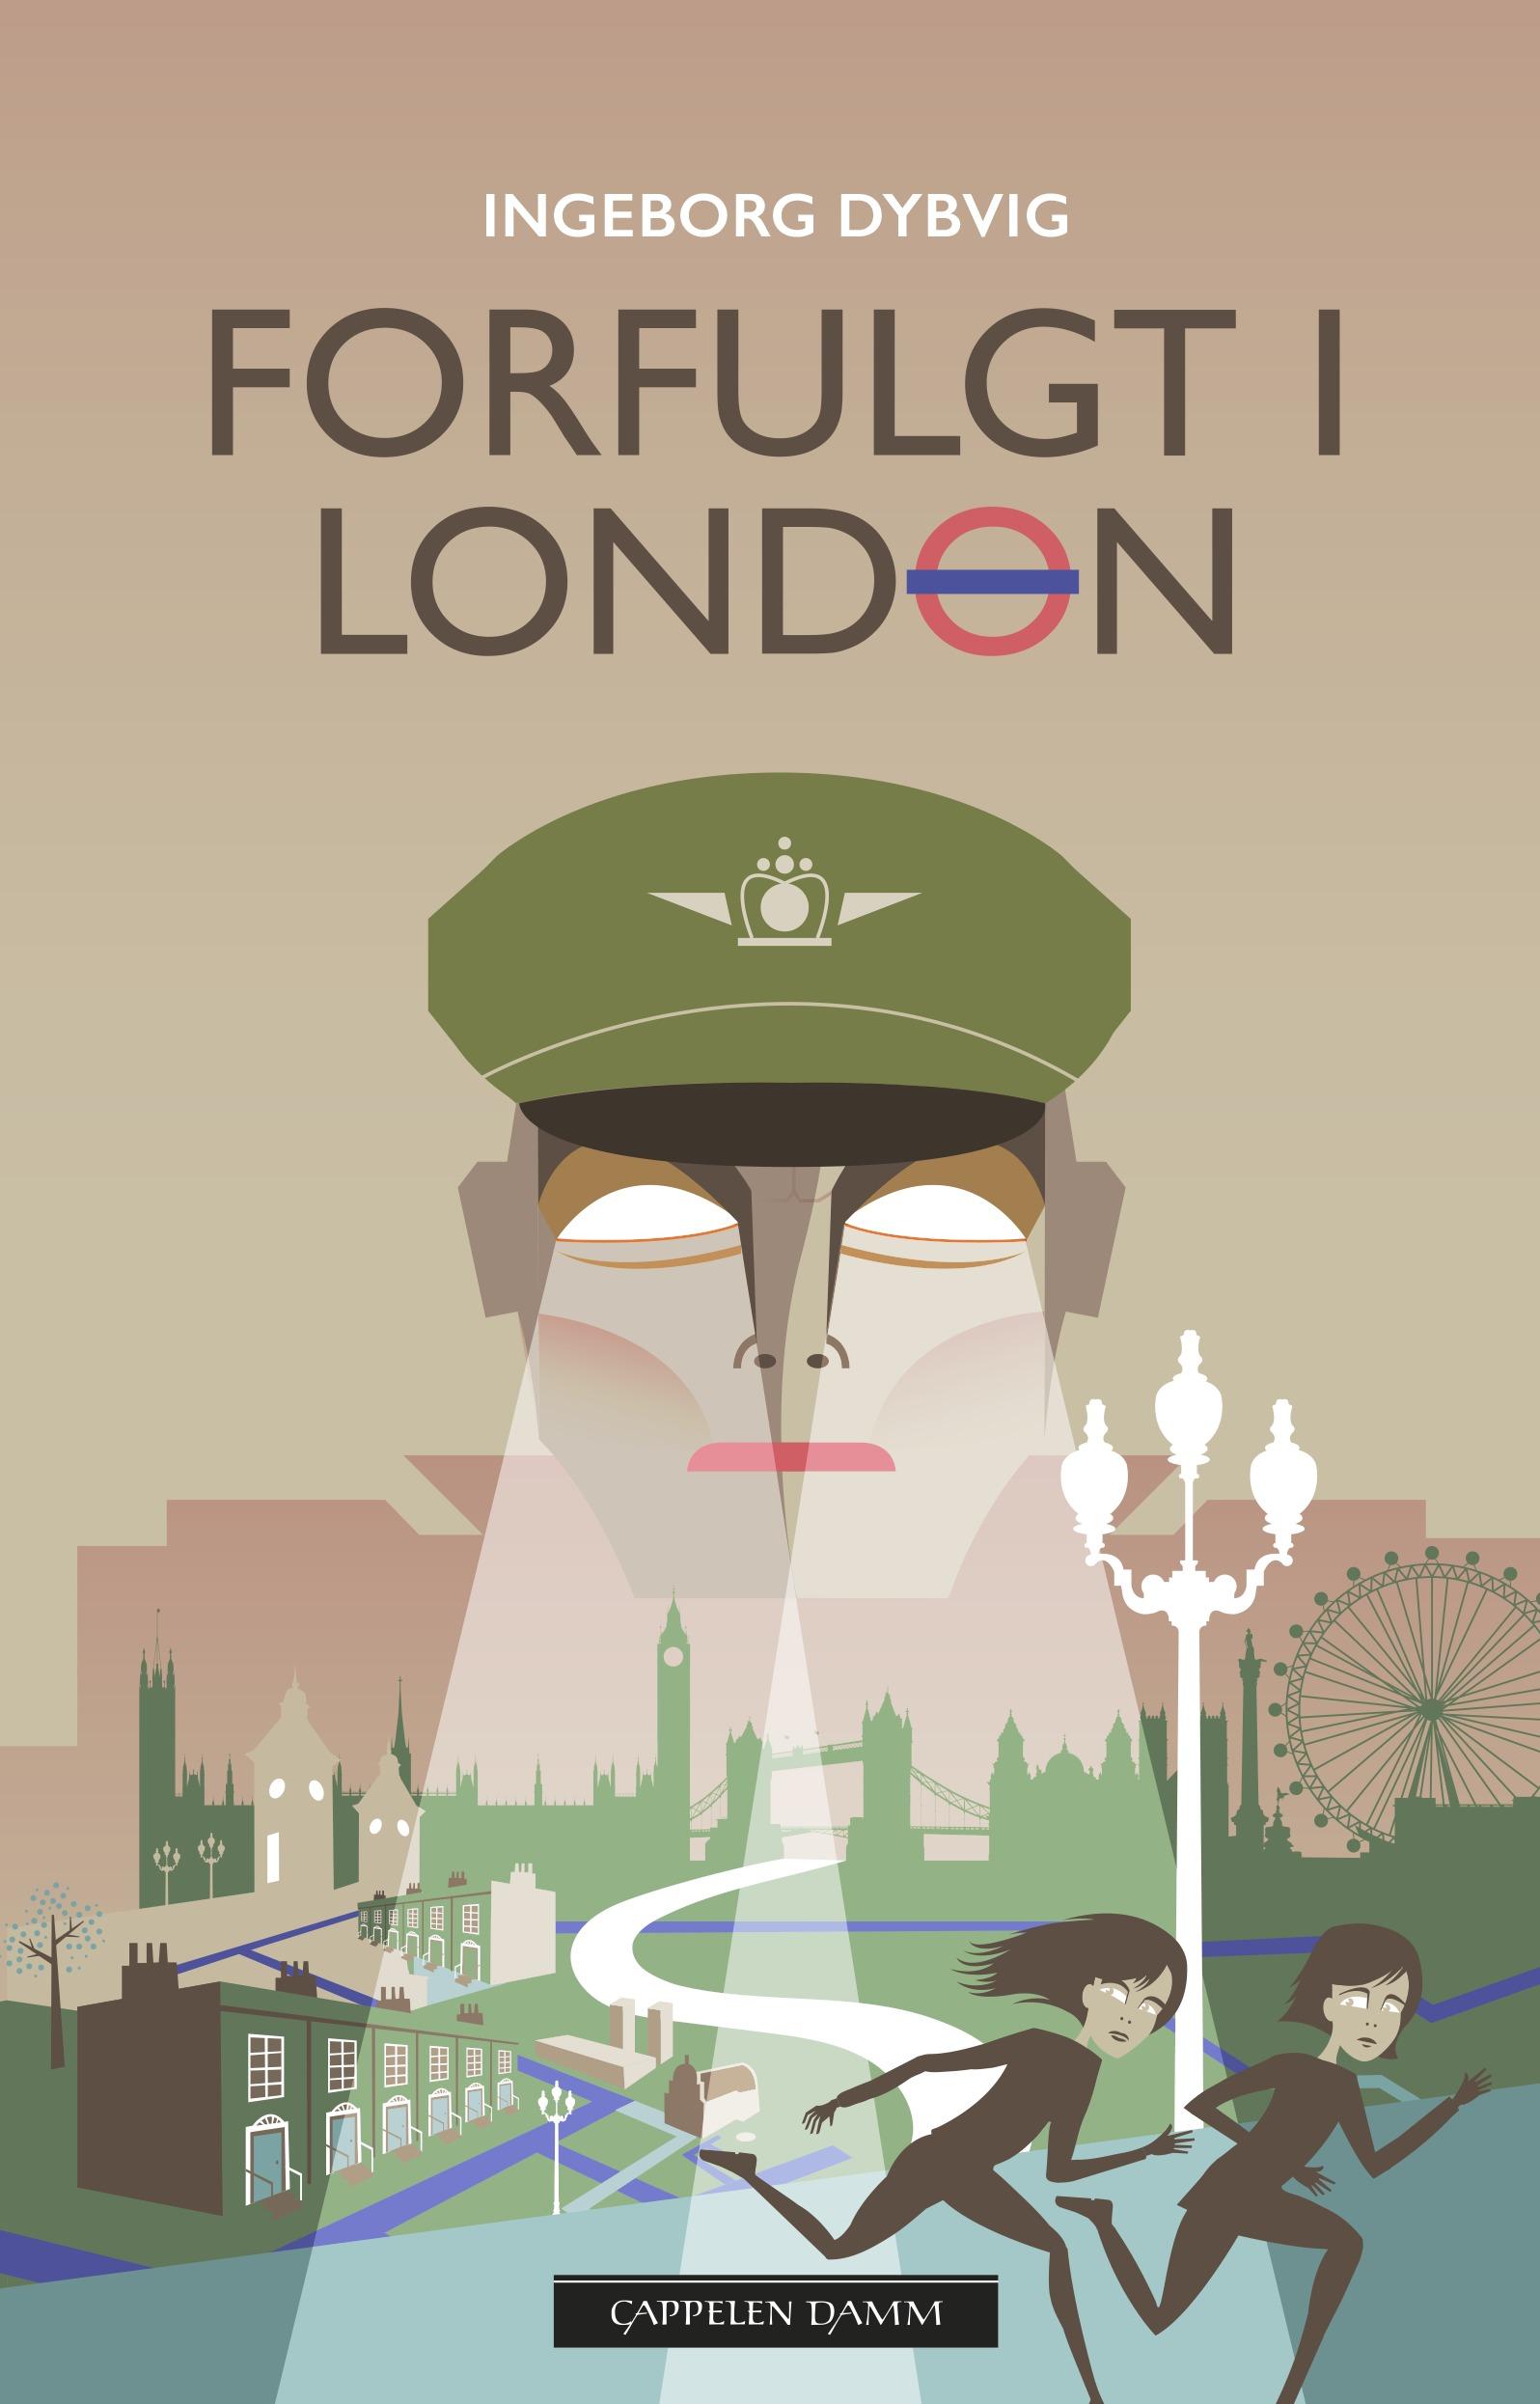 Forfulgt i London